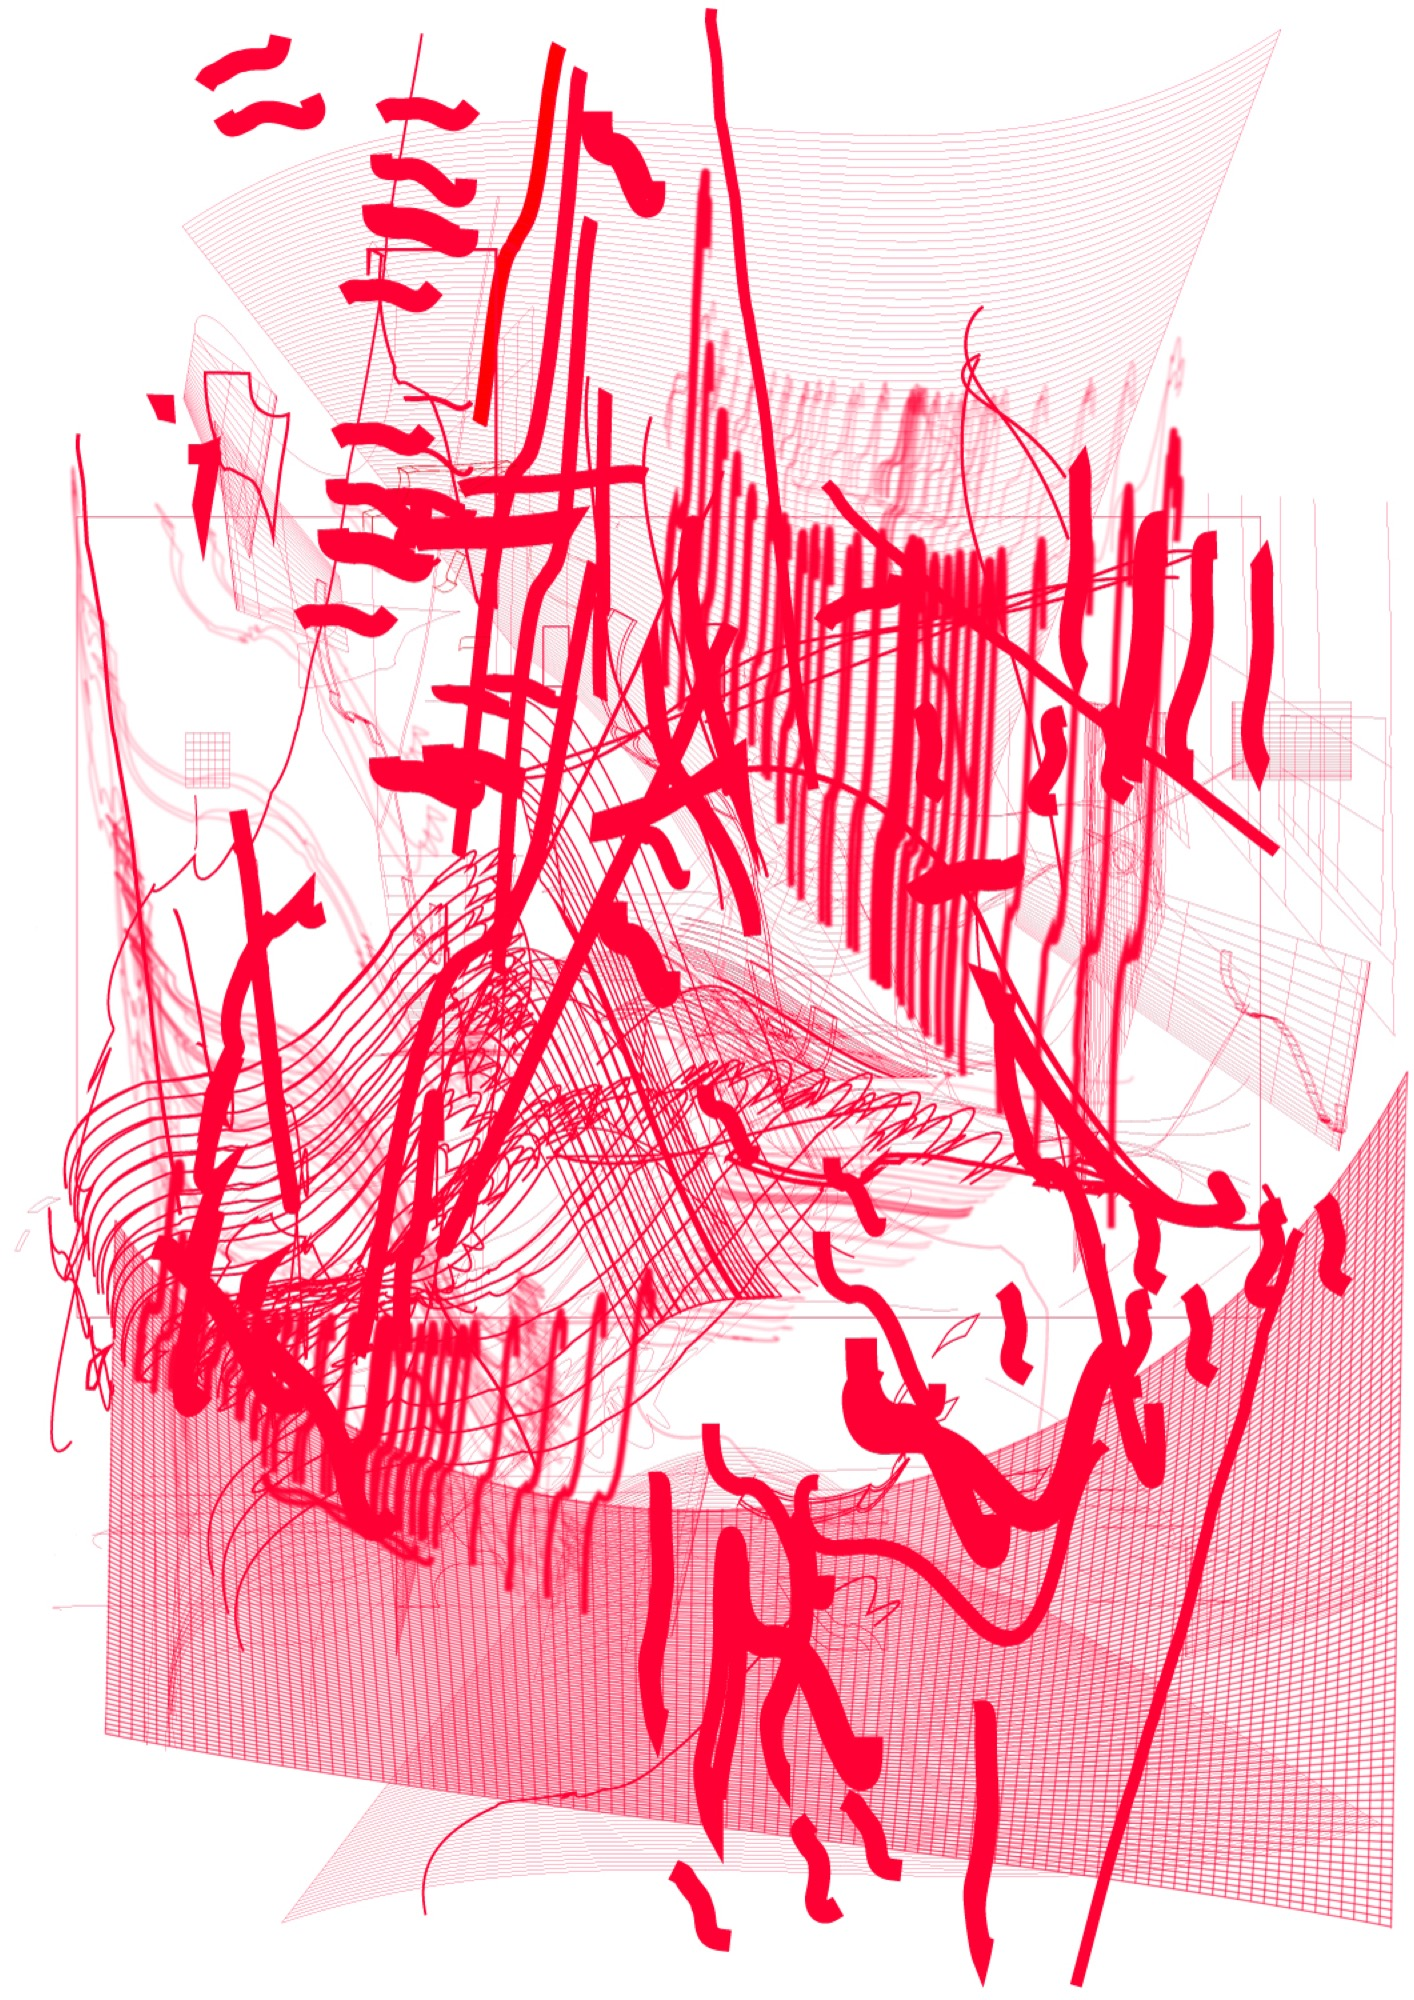 Print_01_Digital Inkejt Print on Hahnemuhle Ultra Smooth_1180mm x 841mm